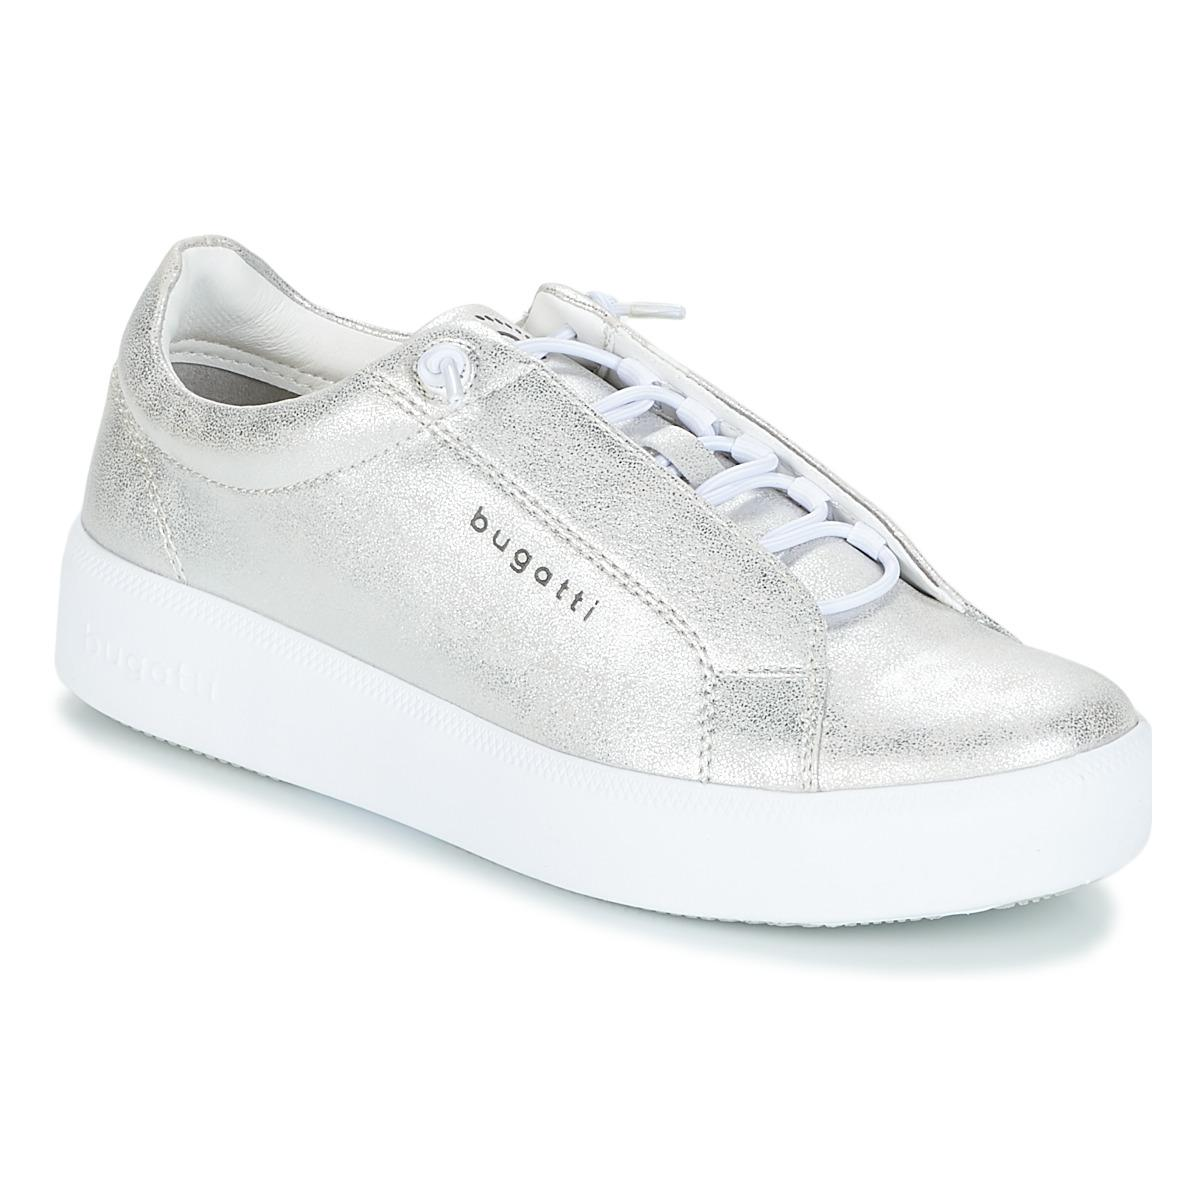 Bugatti - Women s Shoes (trainers) In Silver in Metallic - Lyst 982771561f